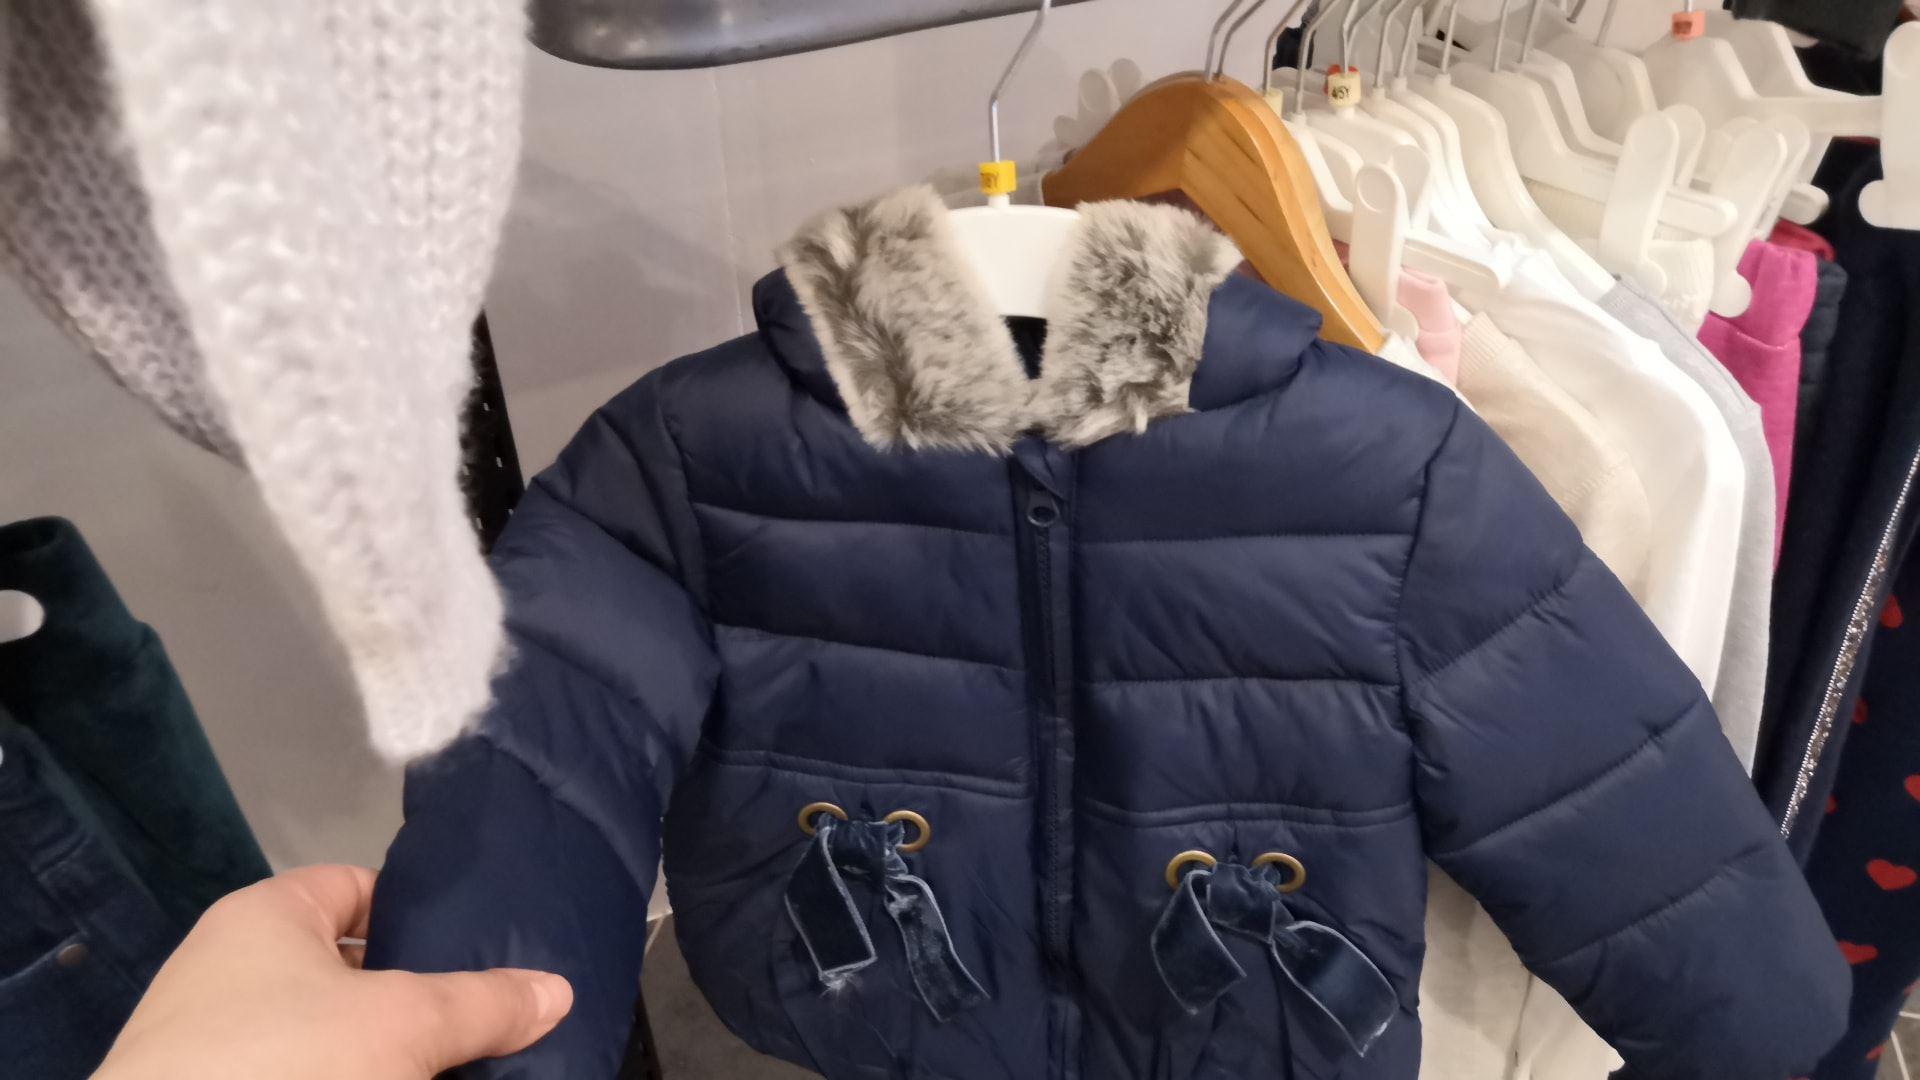 تخفيضات centrepoint 2019 بالفروع ملابس اطفال